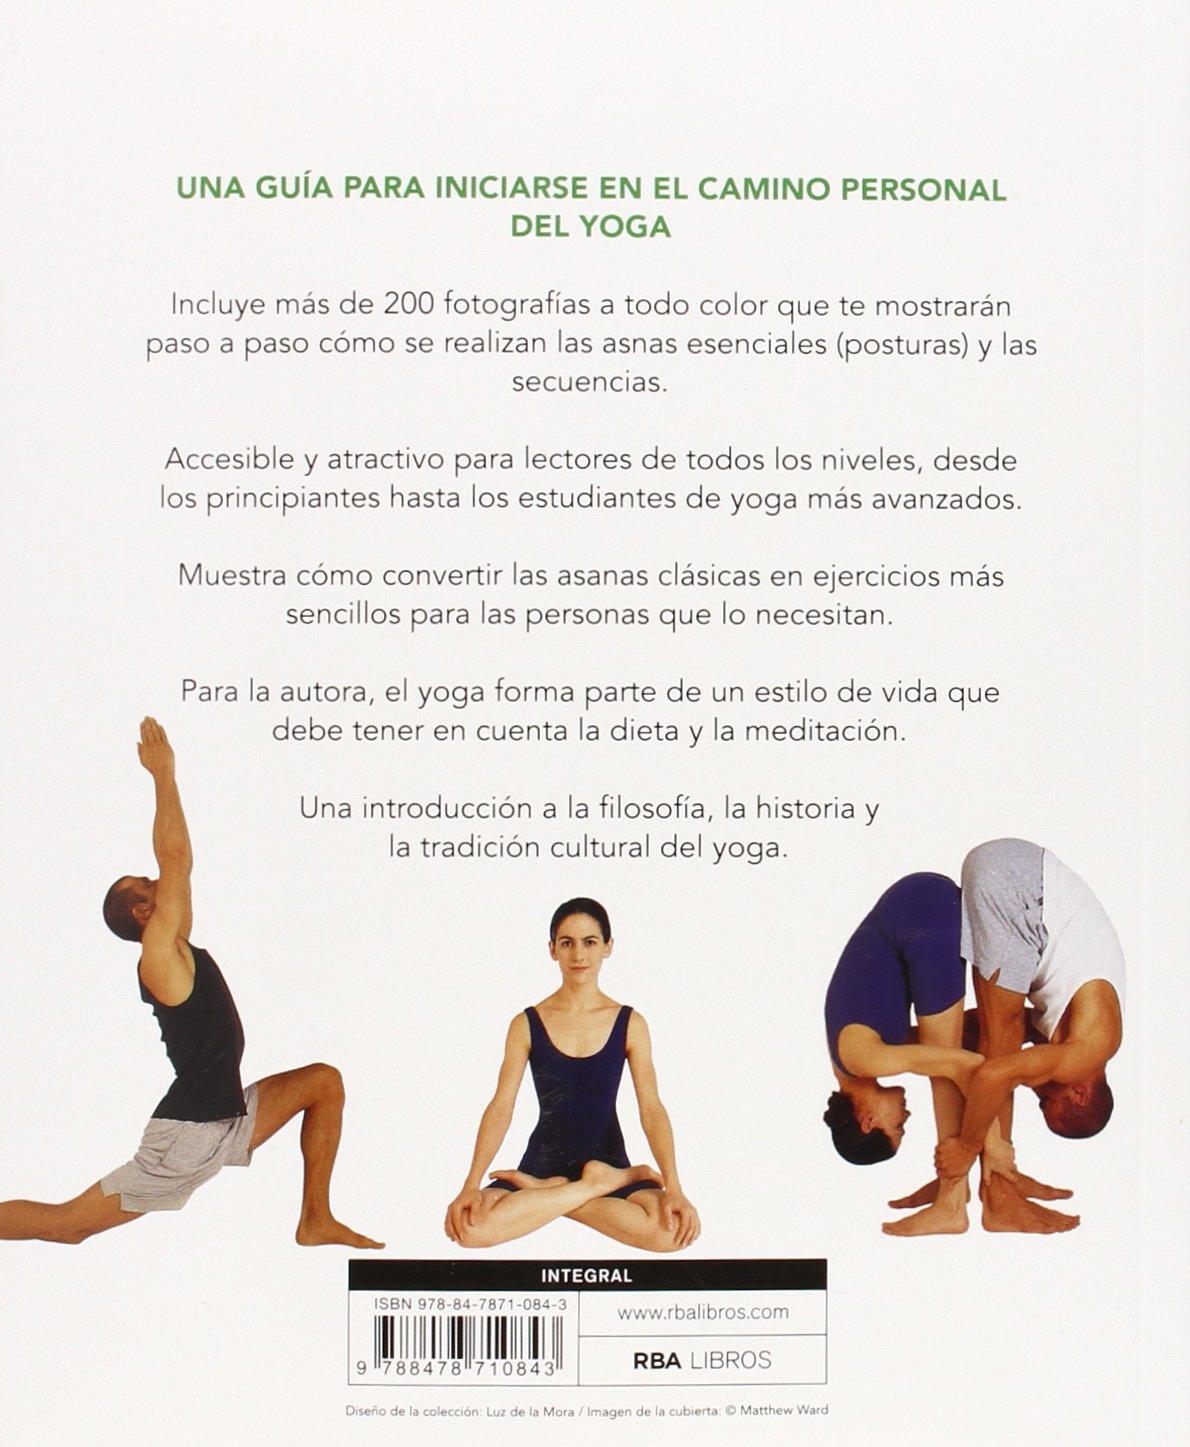 Yoga En Casa (Spanish Edition): Tara Fraser: 9788478710843 ...